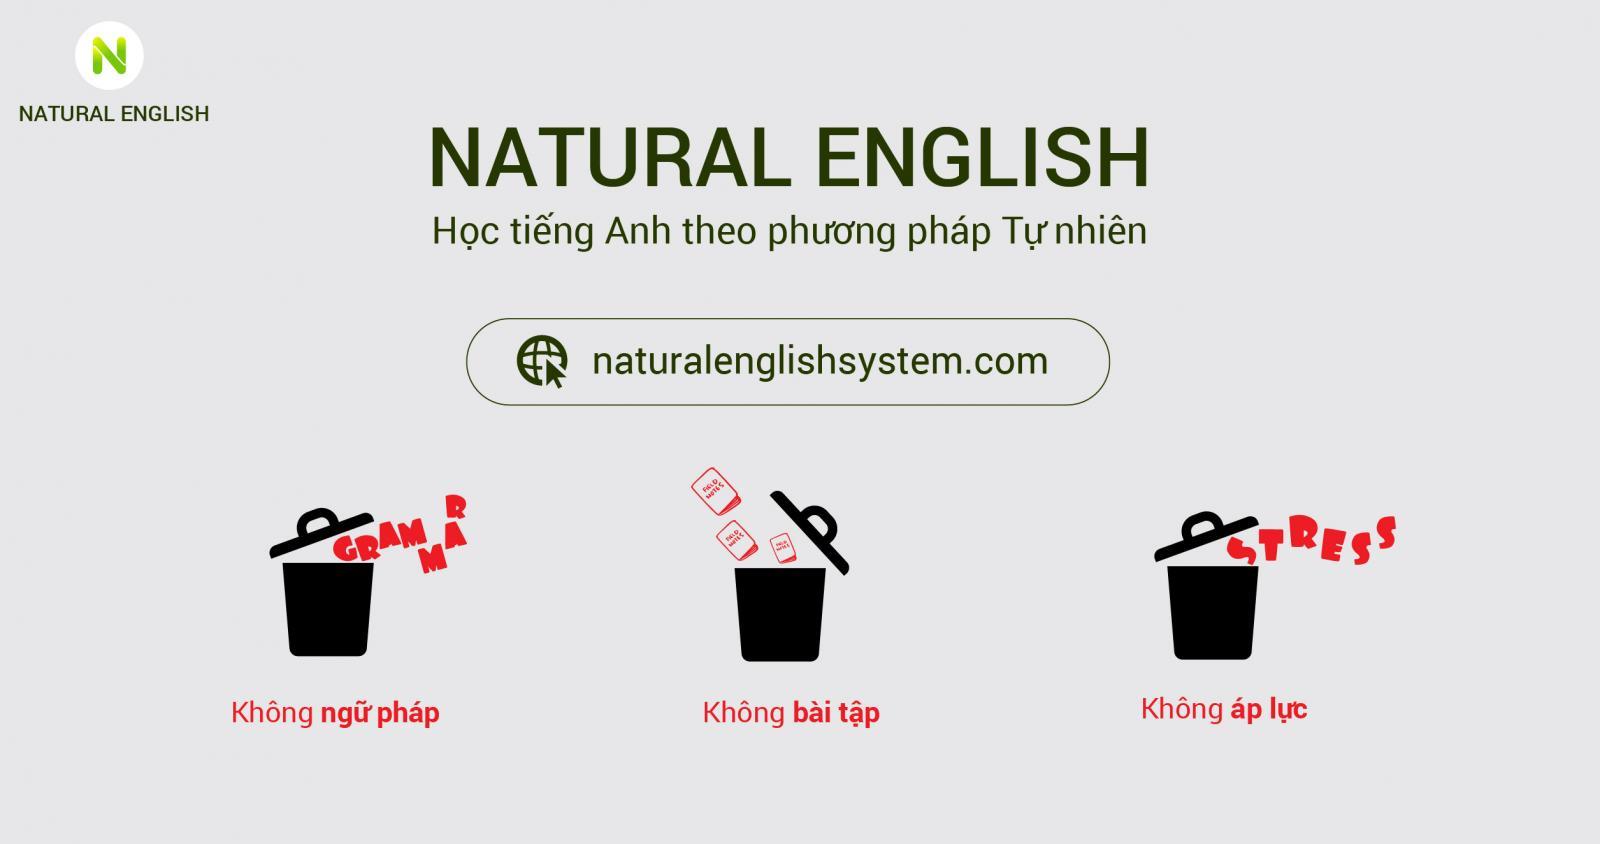 Natural English System